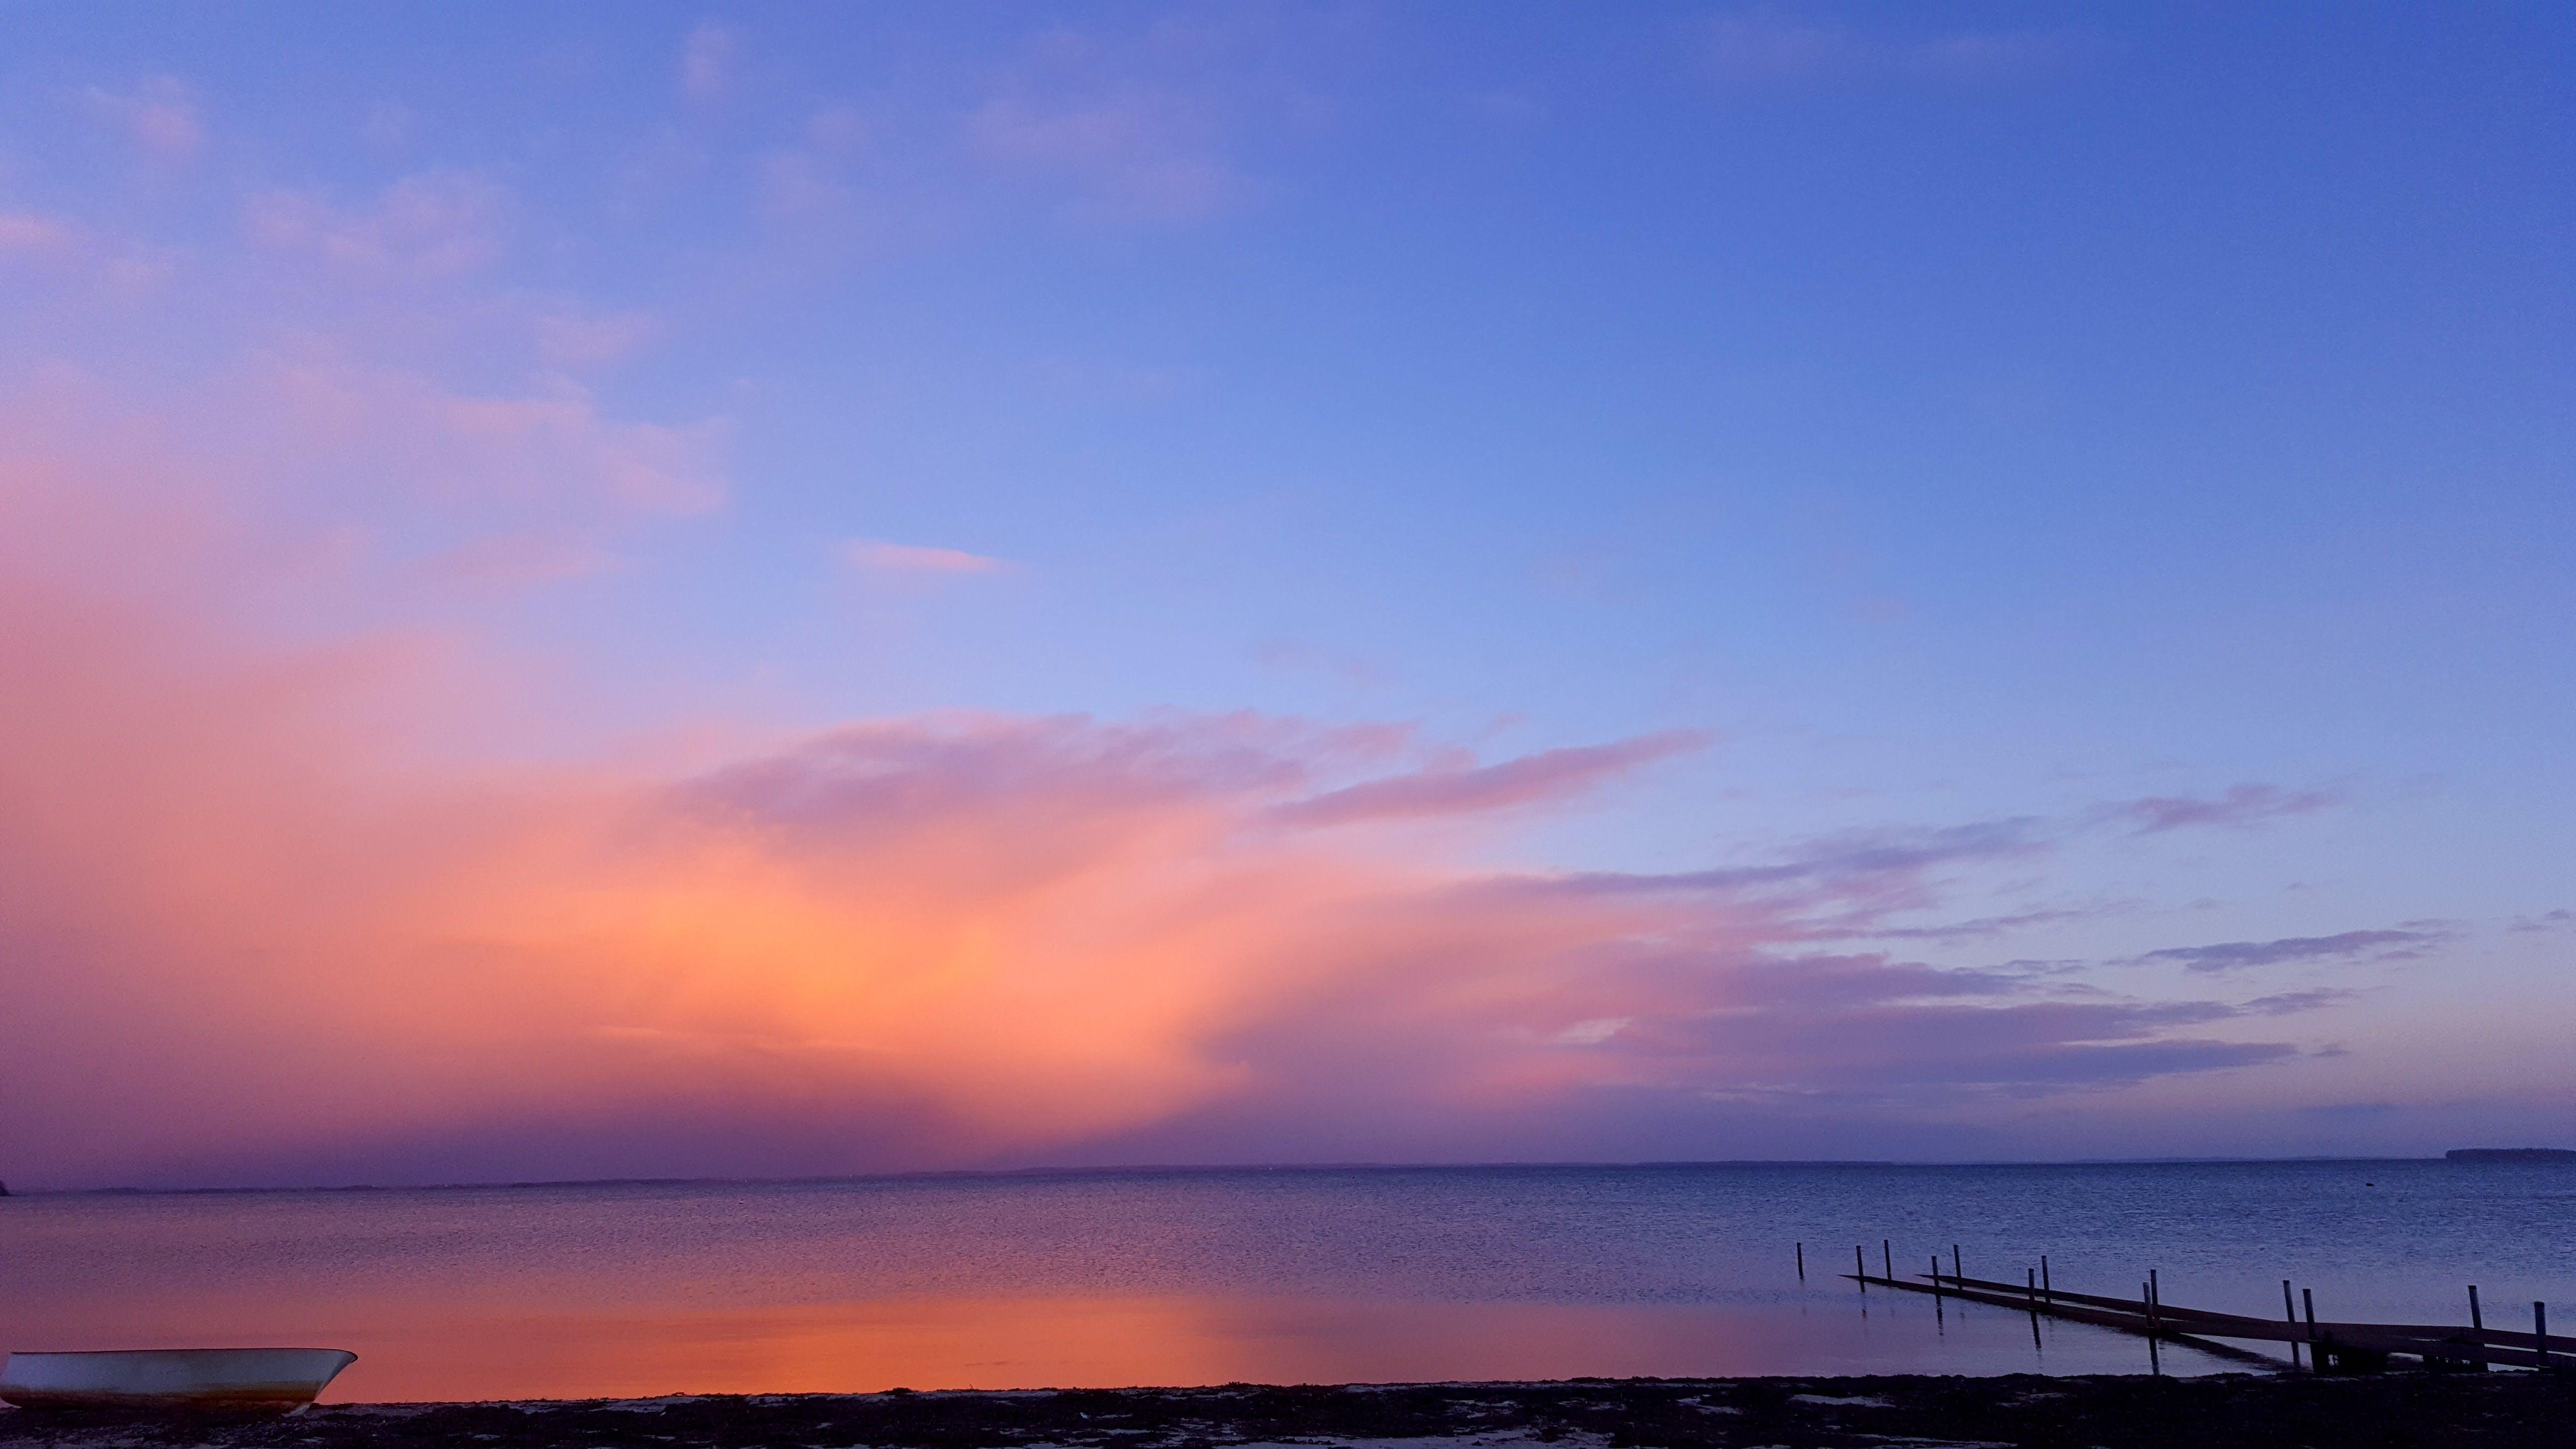 Body of Seawater during Sunset